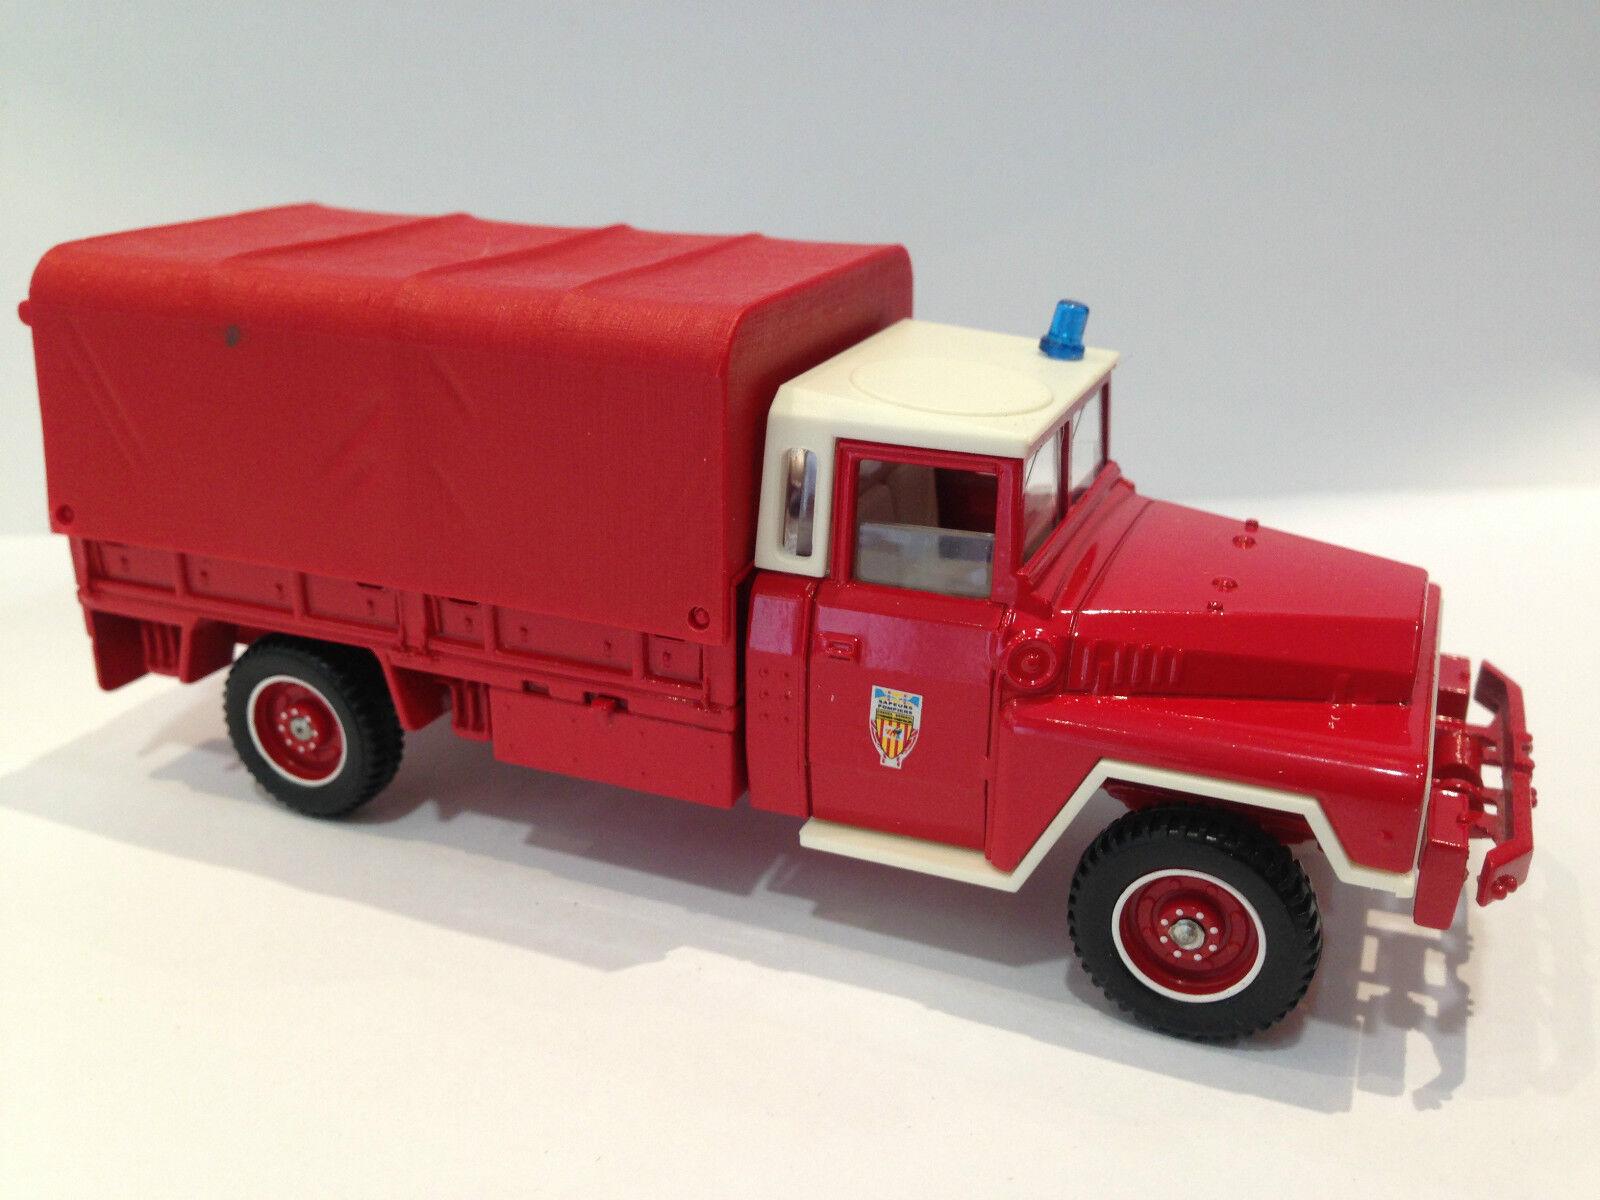 Vintage-Solido-Camión De Juguete Coche ejército Transporter M1 43 ACMAT 4x4 bache 2192